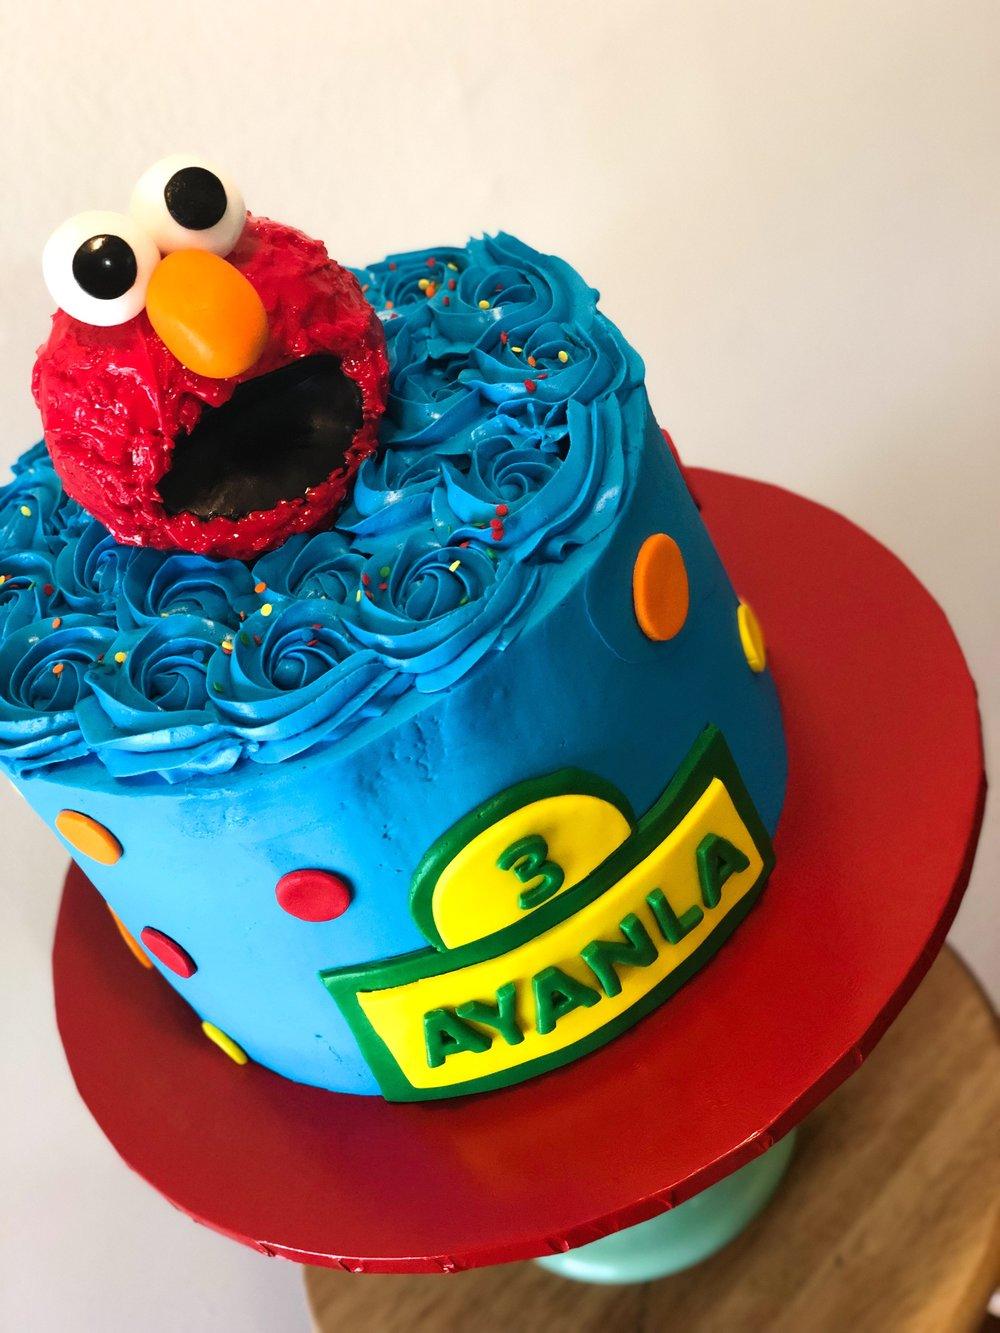 Blue Rosette Elmo Birthday Cake - Mwokaji Cakery.JPEG